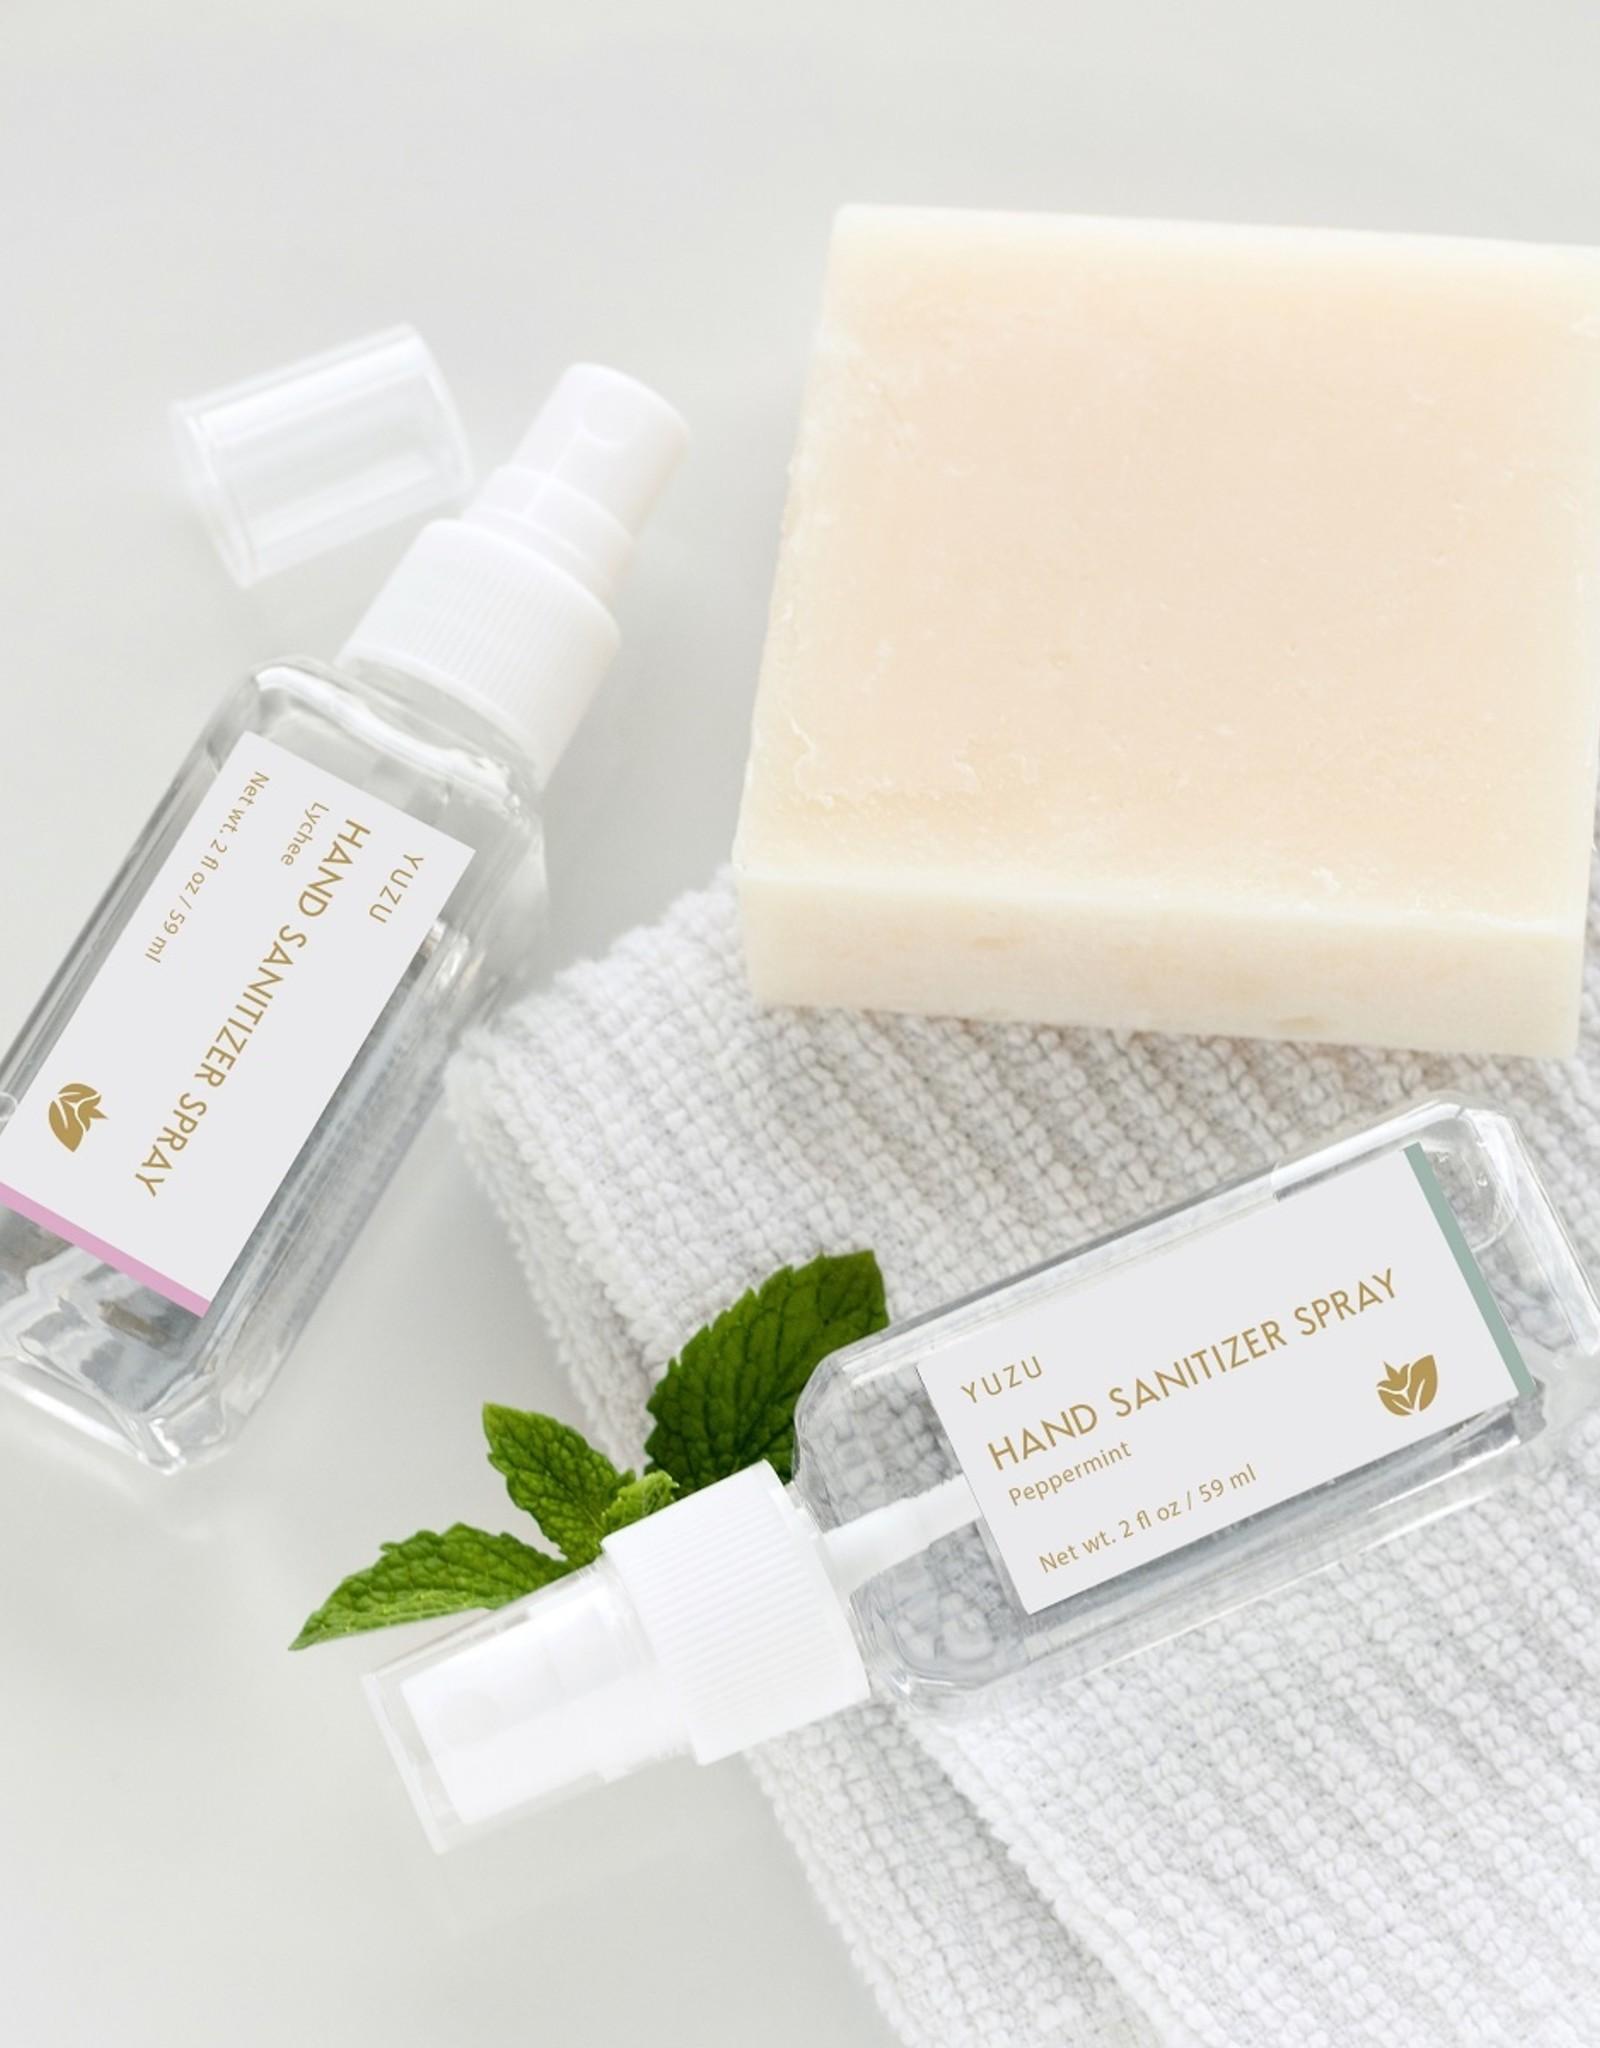 Lychee Hand Sanitizer Spray (2oz)